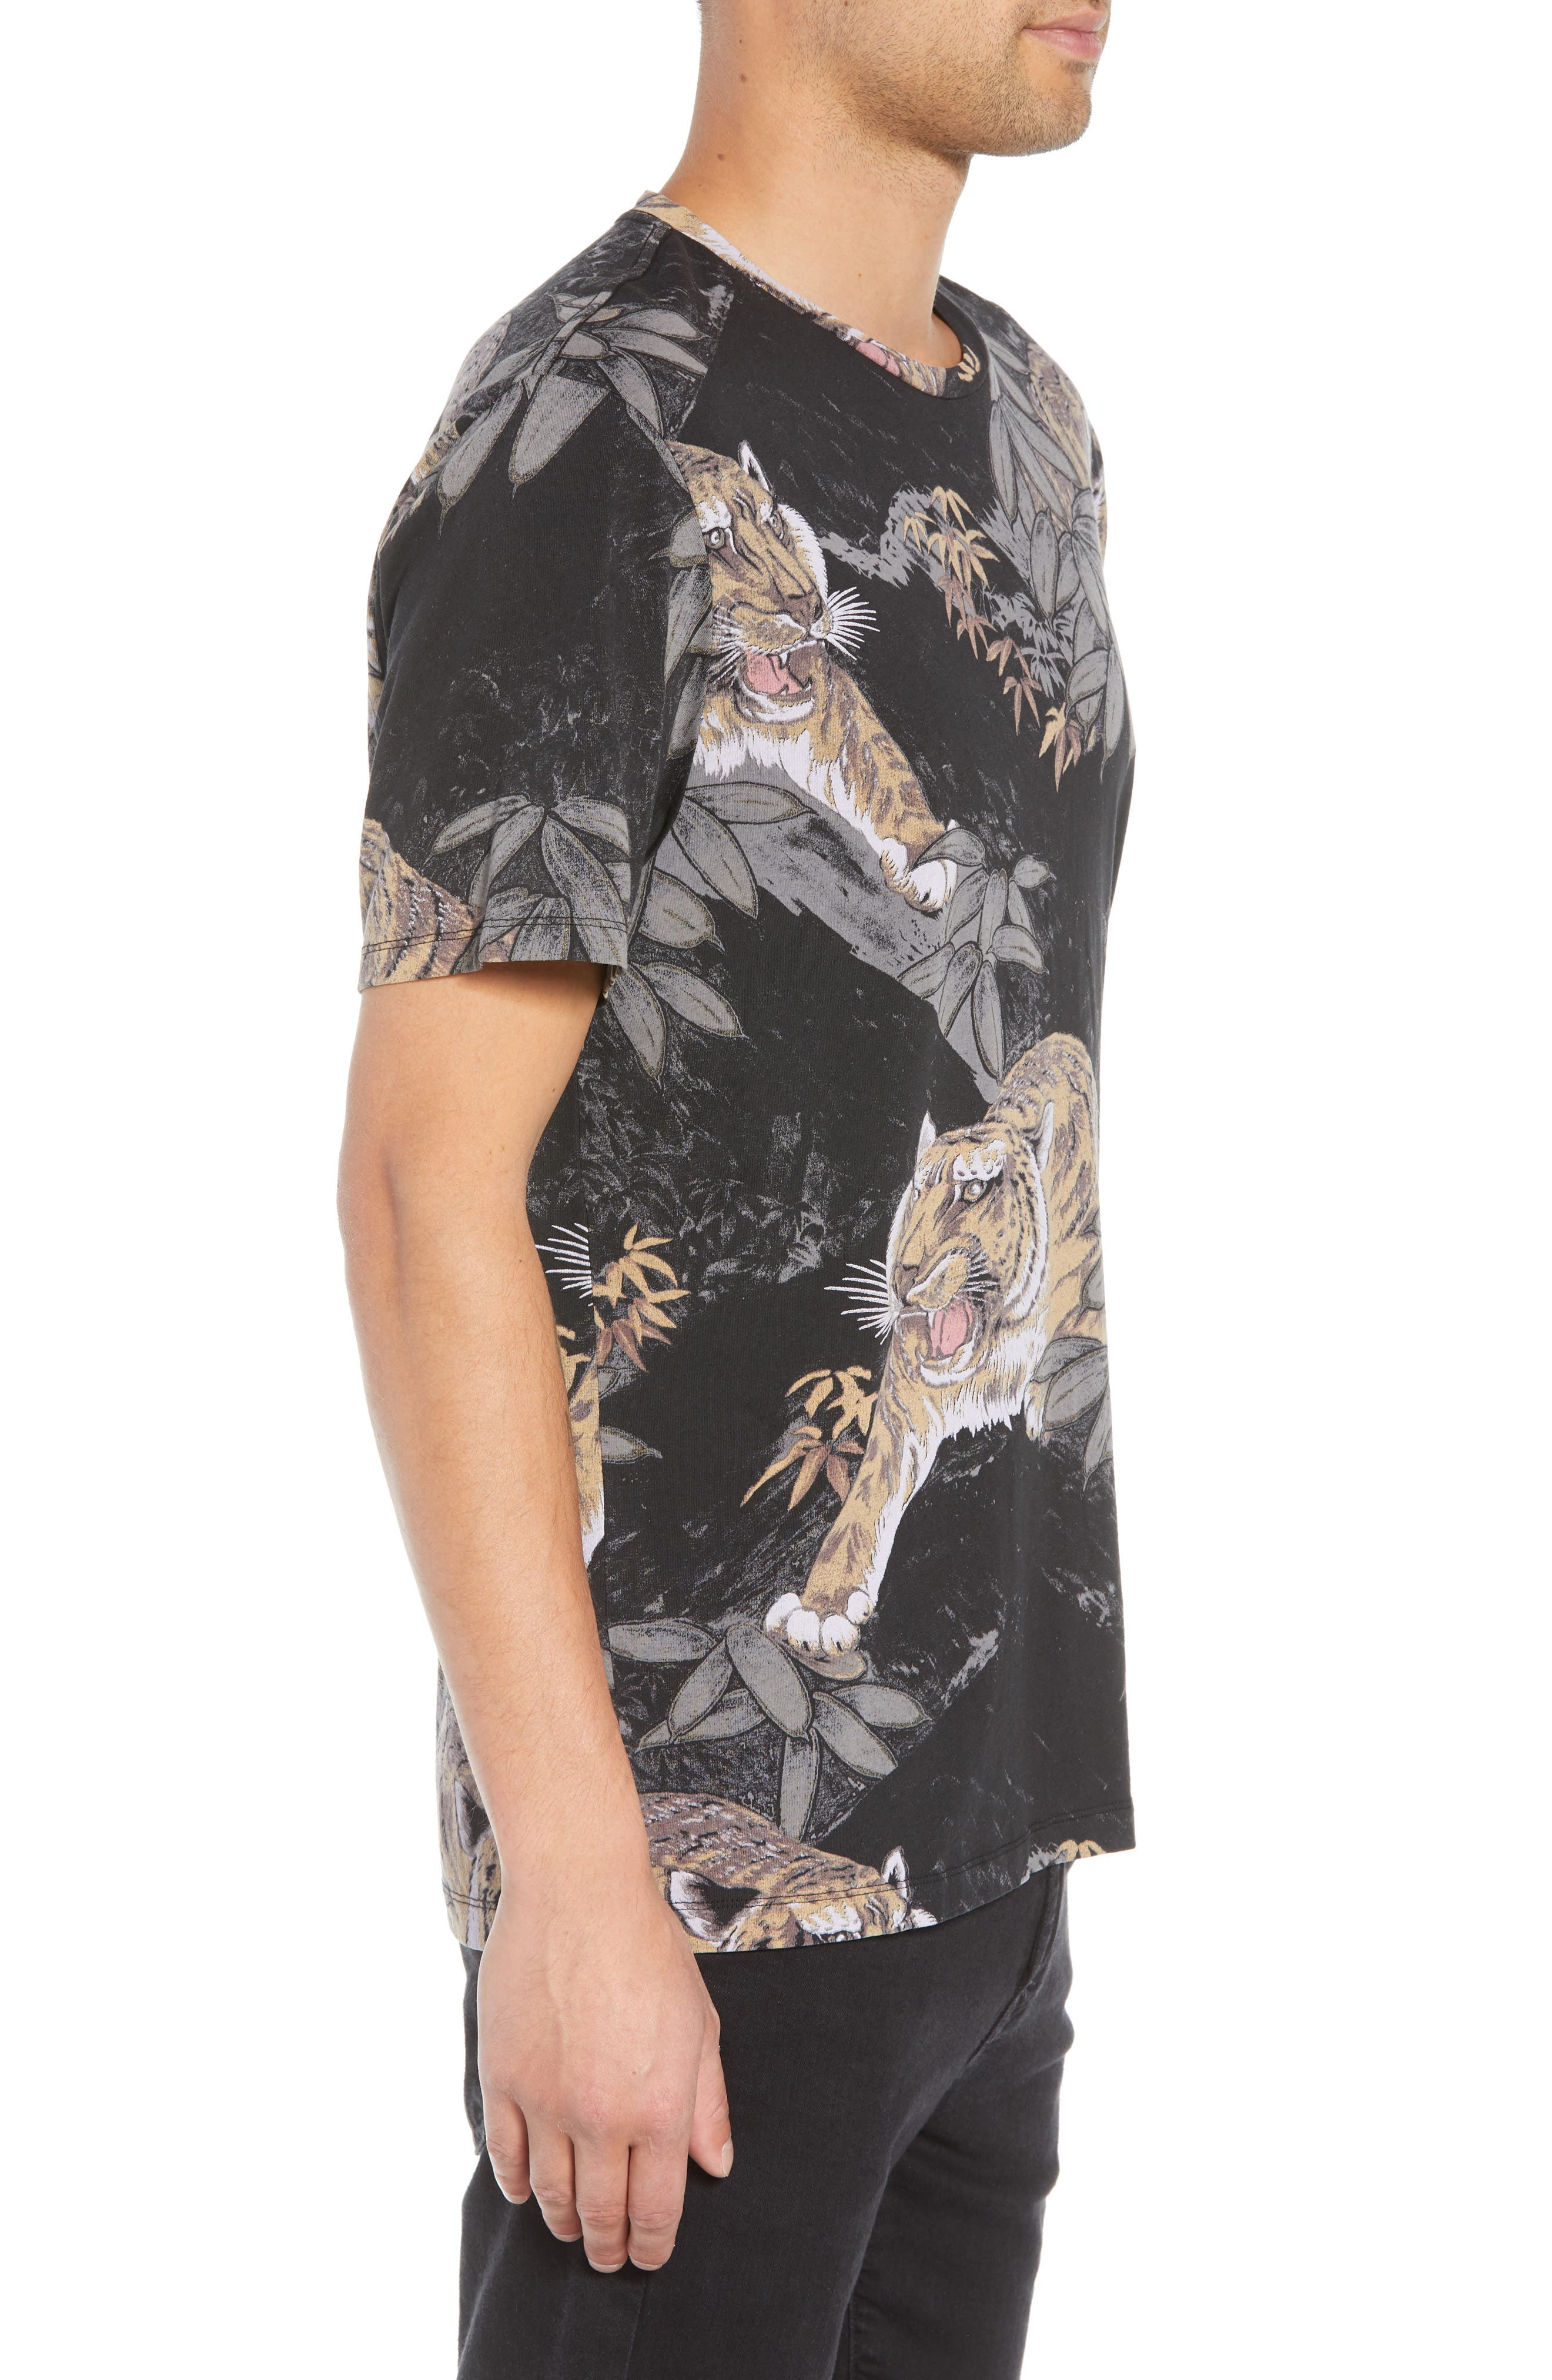 Chokai Slim Fit T-Shirt,                             Alternate thumbnail 3, color,                             VINTAGE BLACK